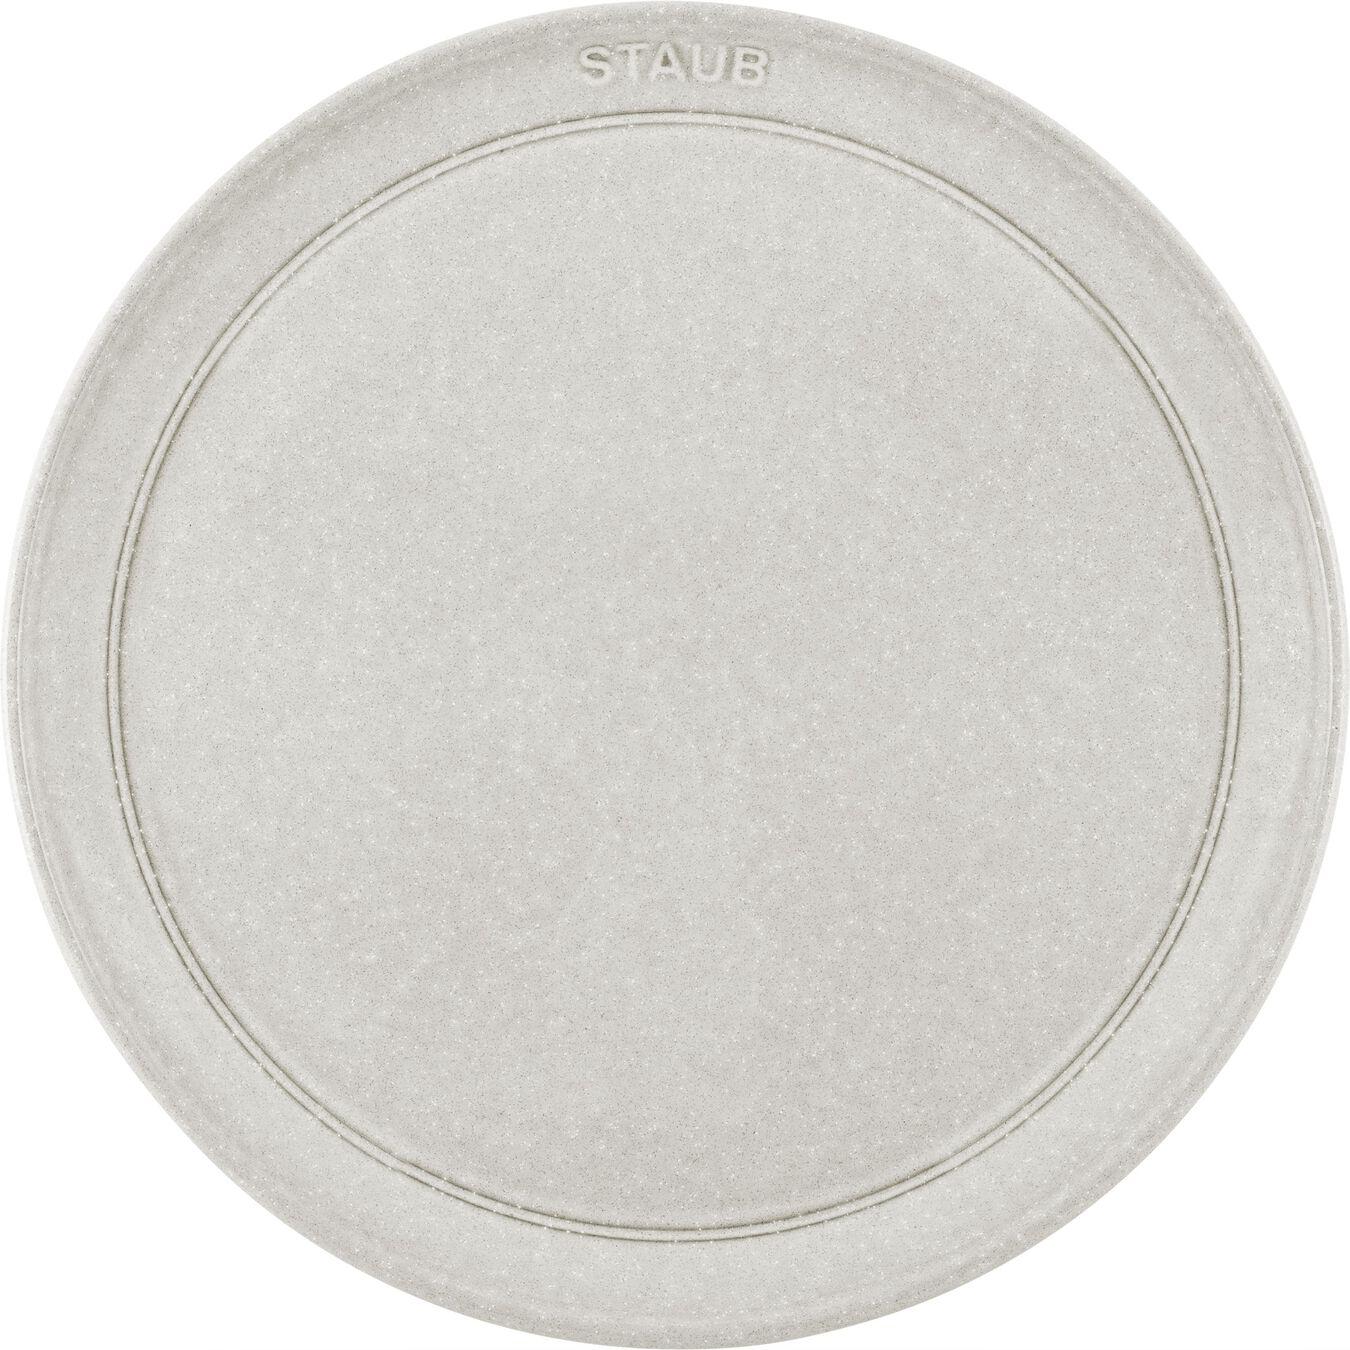 26 cm Ceramic round Plate flat, white truffle,,large 2